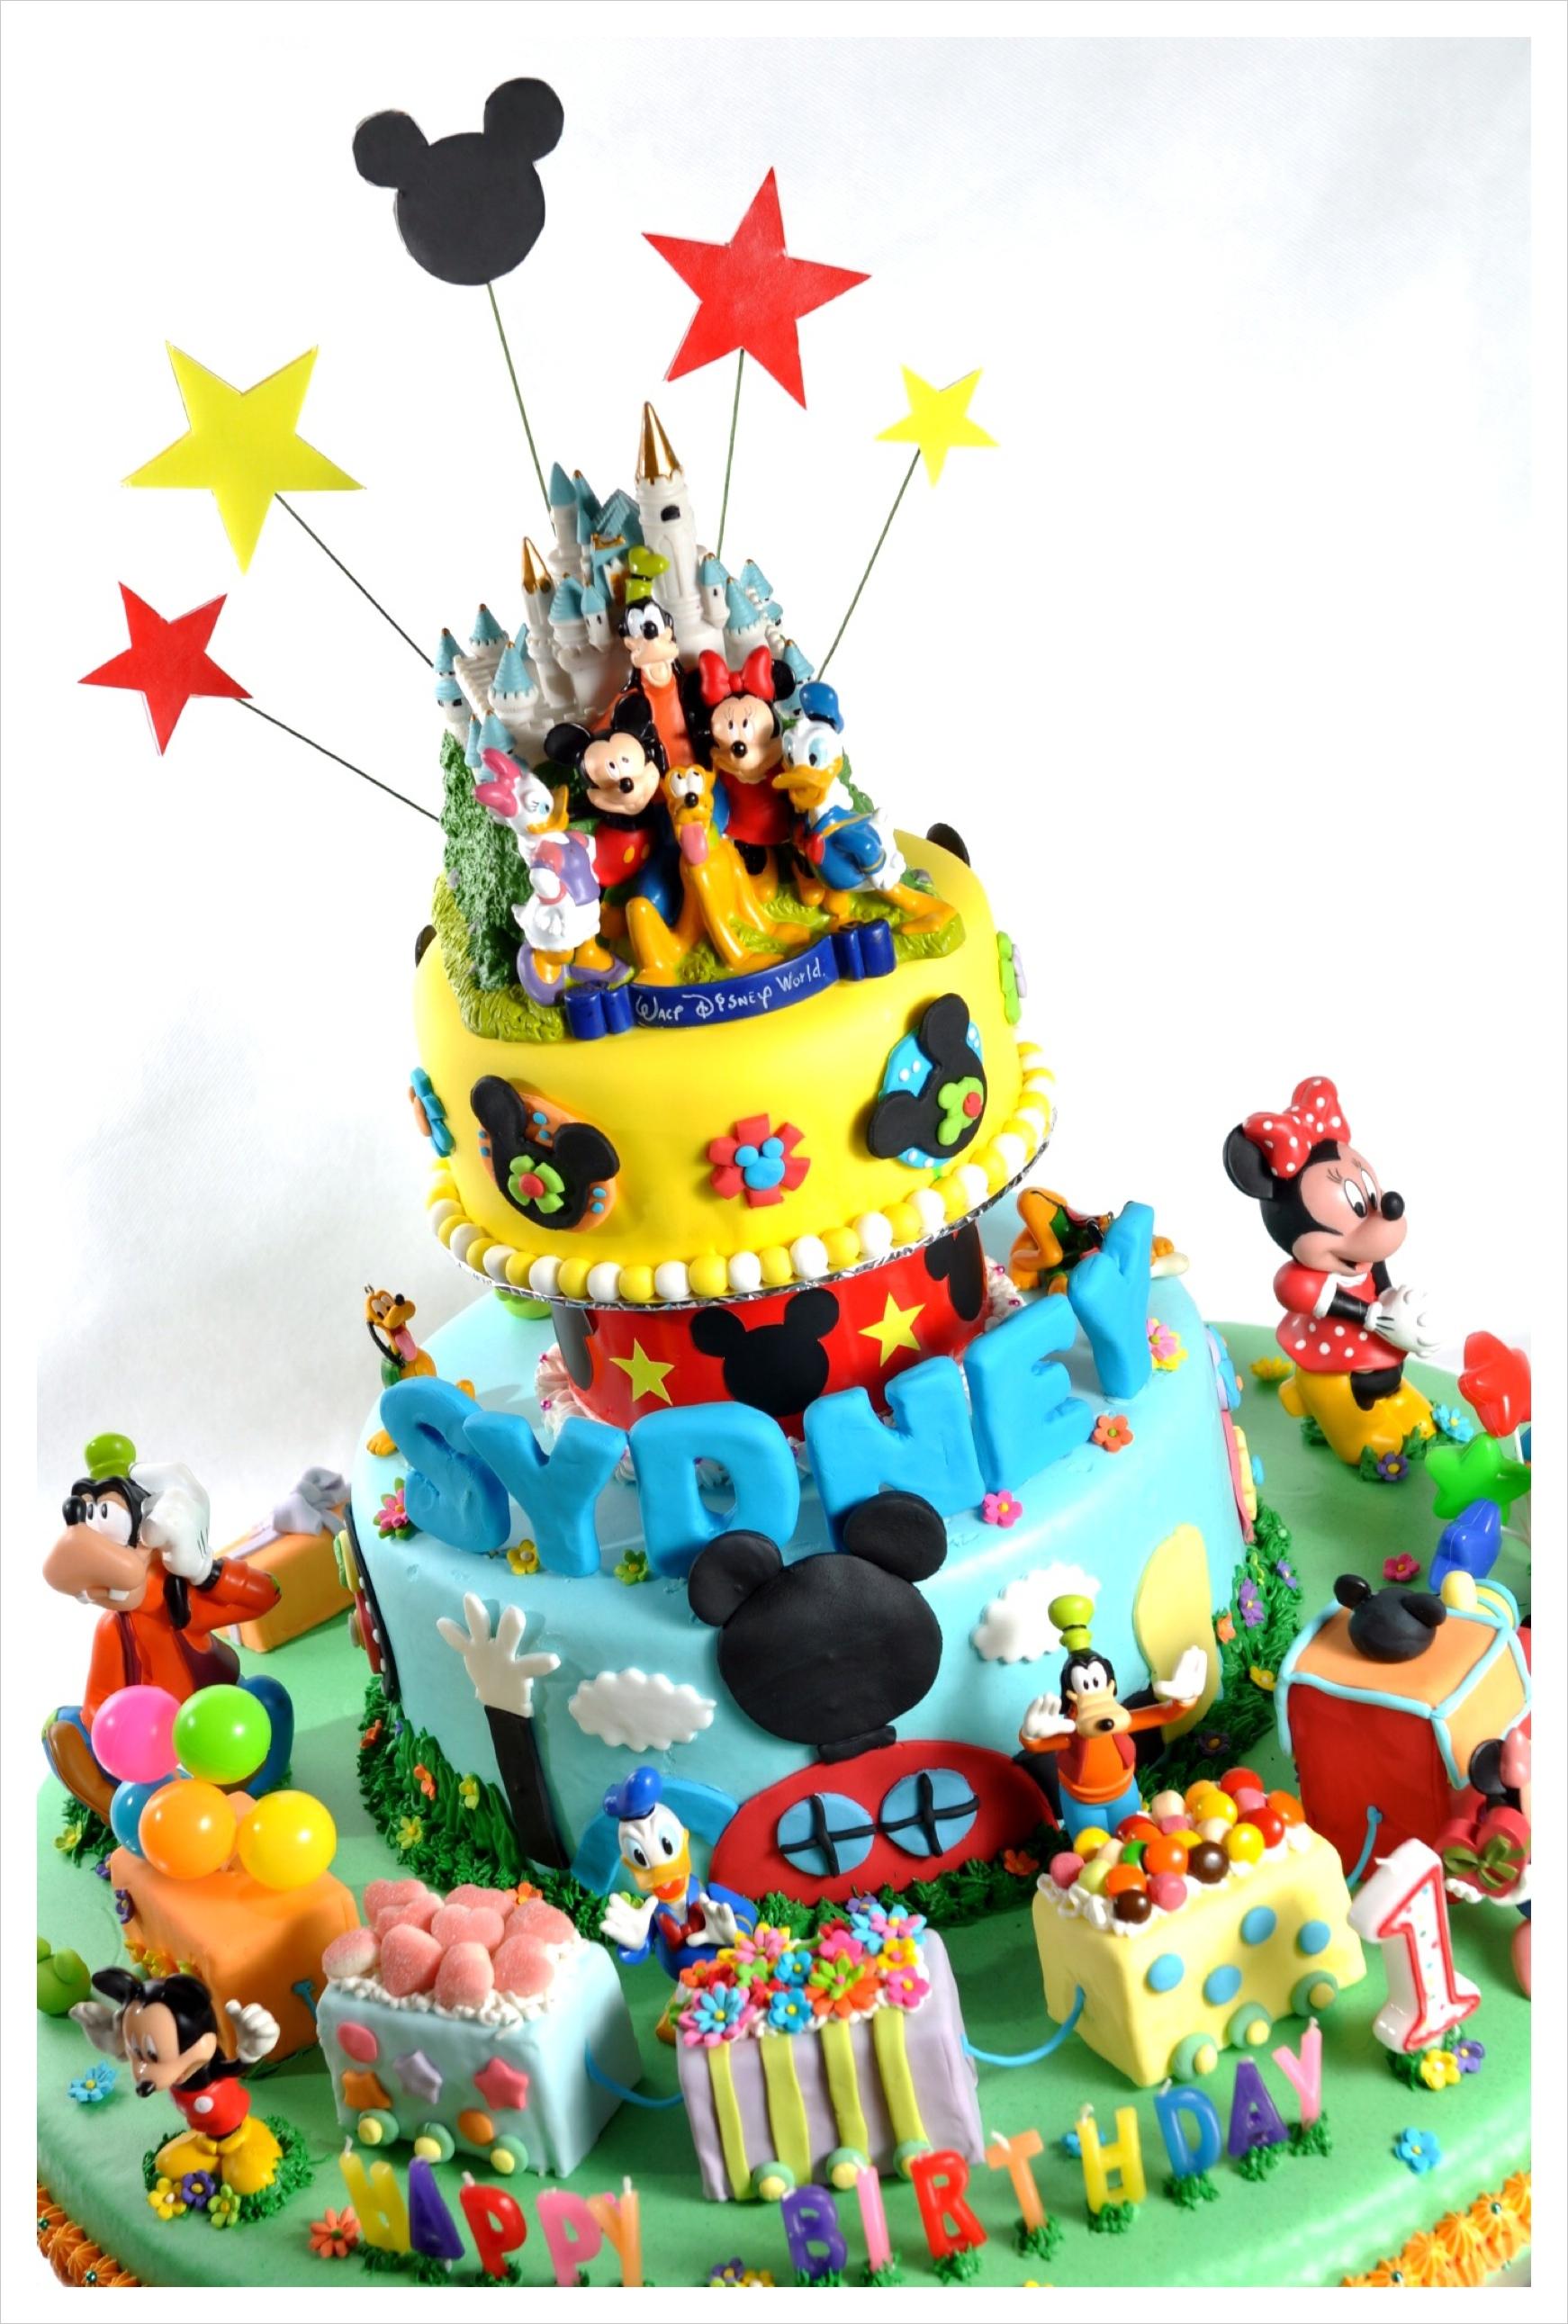 birthday cakes di jakarta 6 on birthday cakes di jakarta